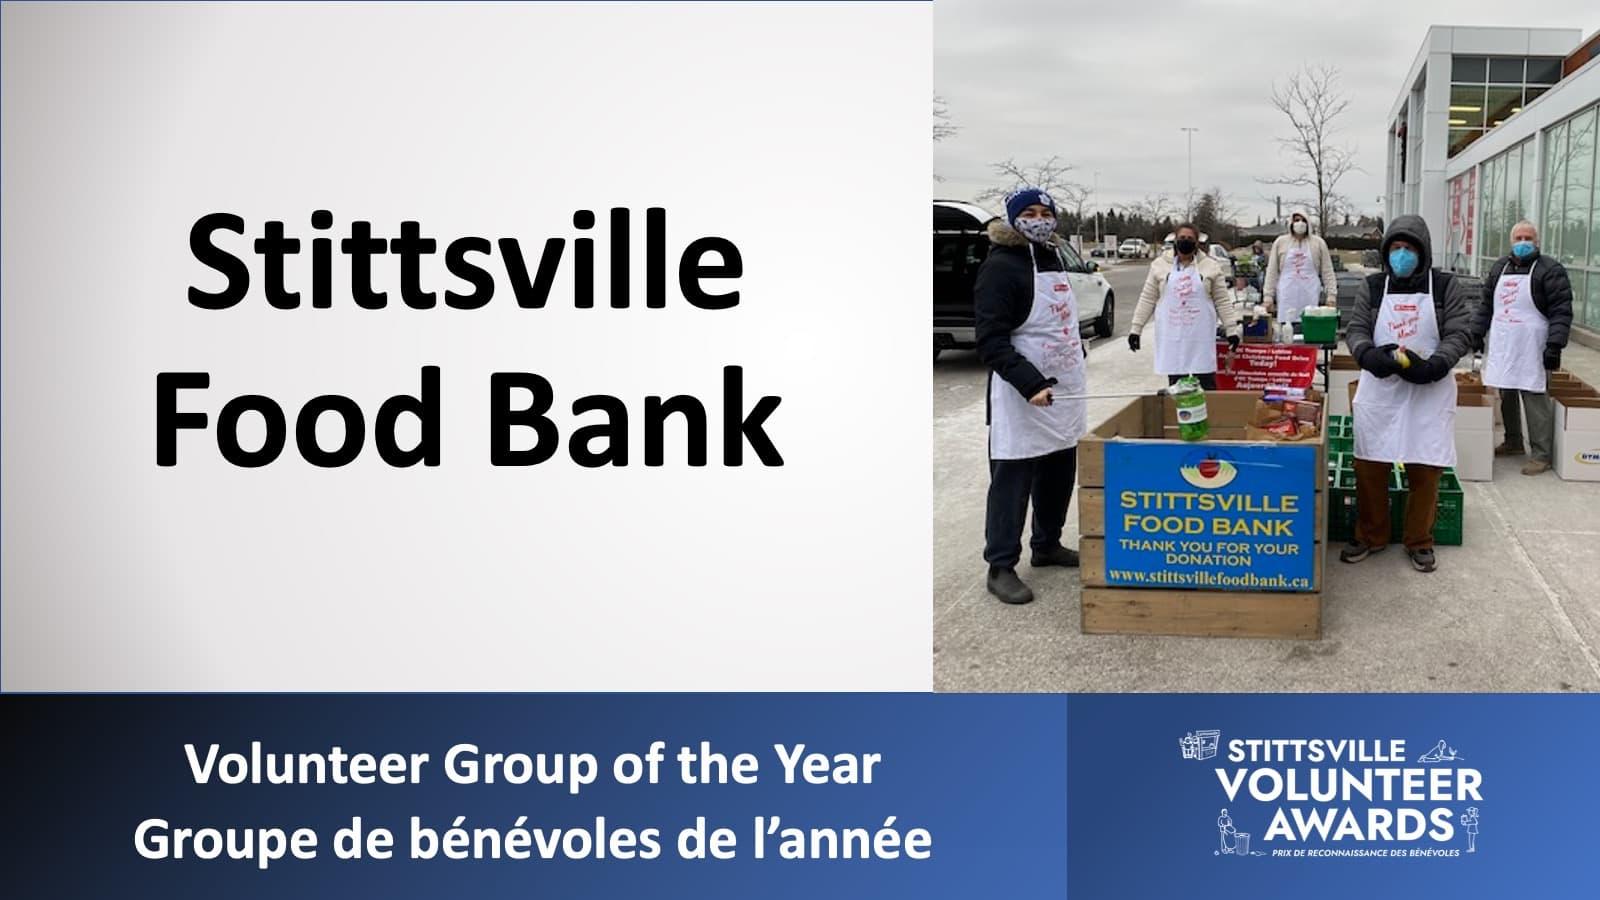 Stittsville Food Bank